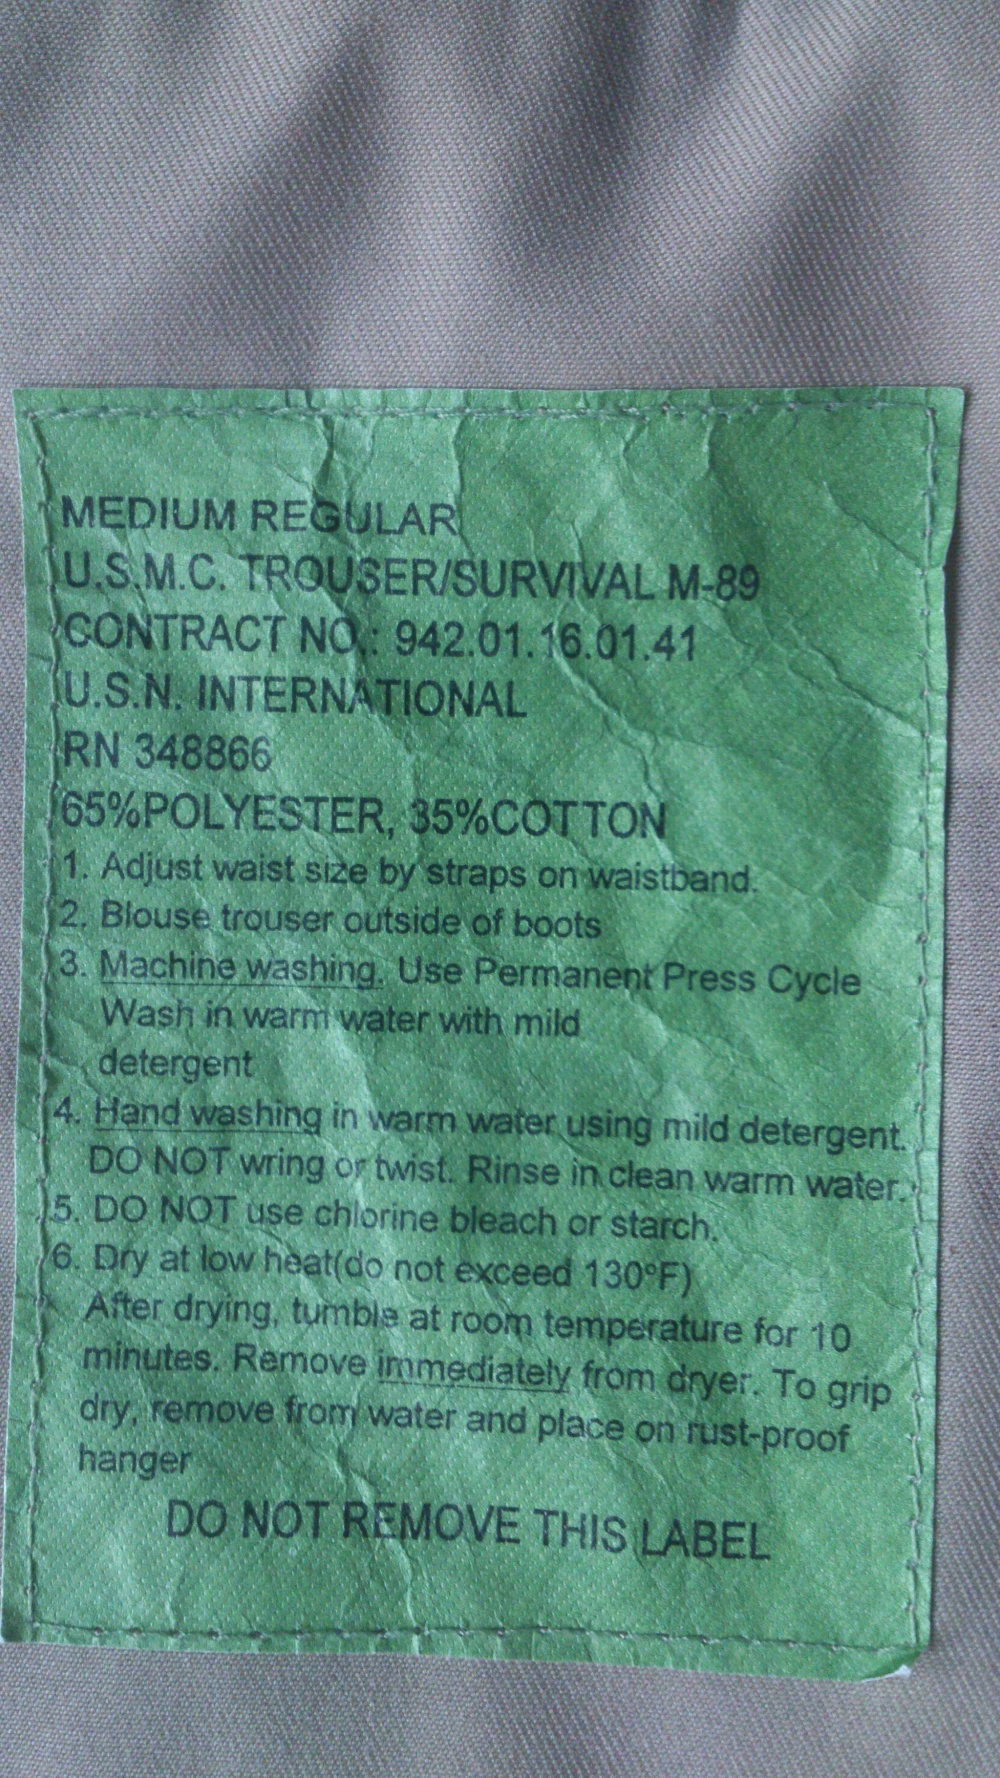 Брюки морского пехотинца США U.S.M.C.trouser/survival M - 89  M - R